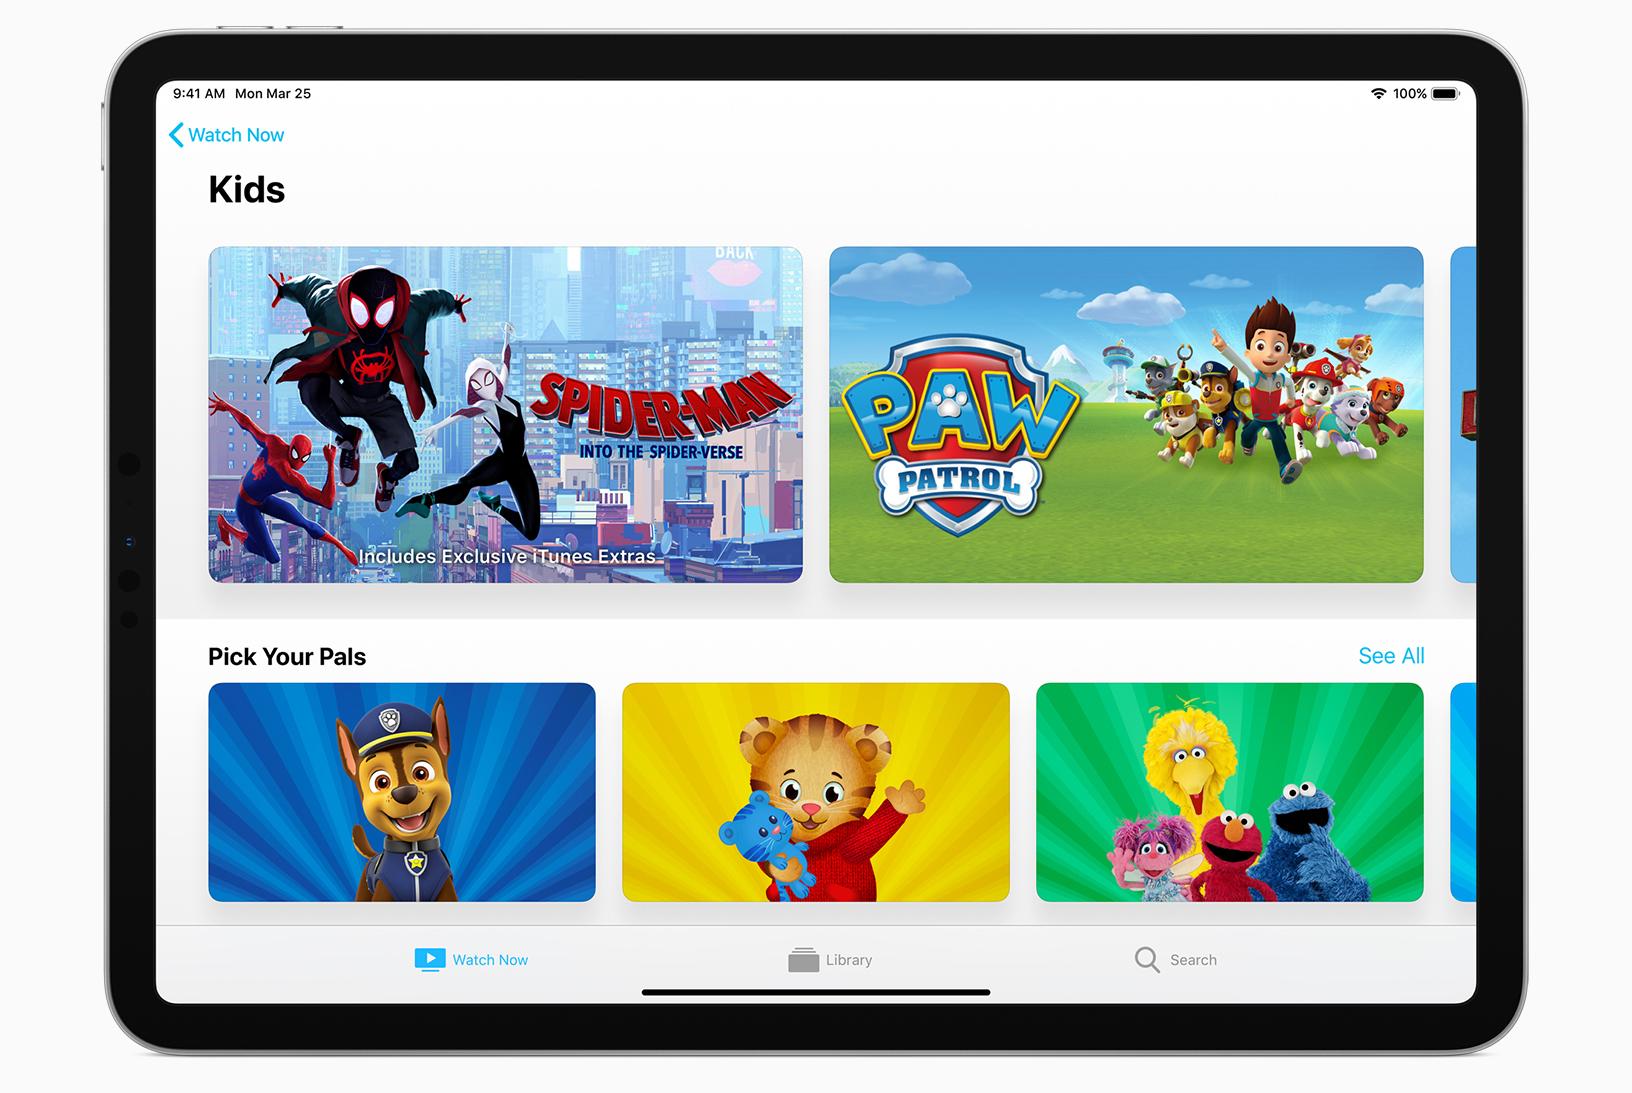 https://www.macfreak.nl/modules/news/images/zArt.Apple_TV_app_iPad_kids_032519.jpg